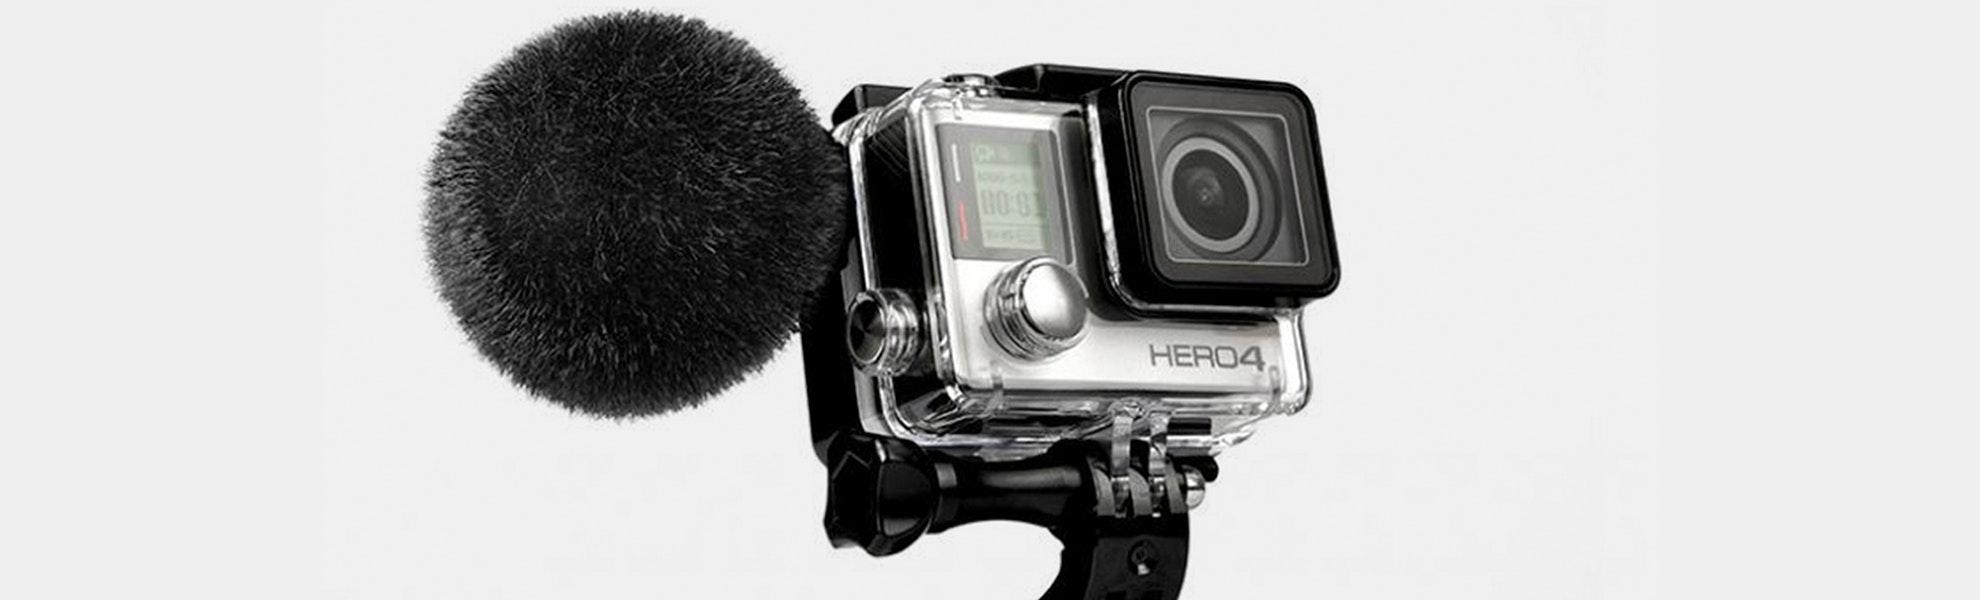 Sennheiser MKE 2 Elements GoPro HERO4 Mic